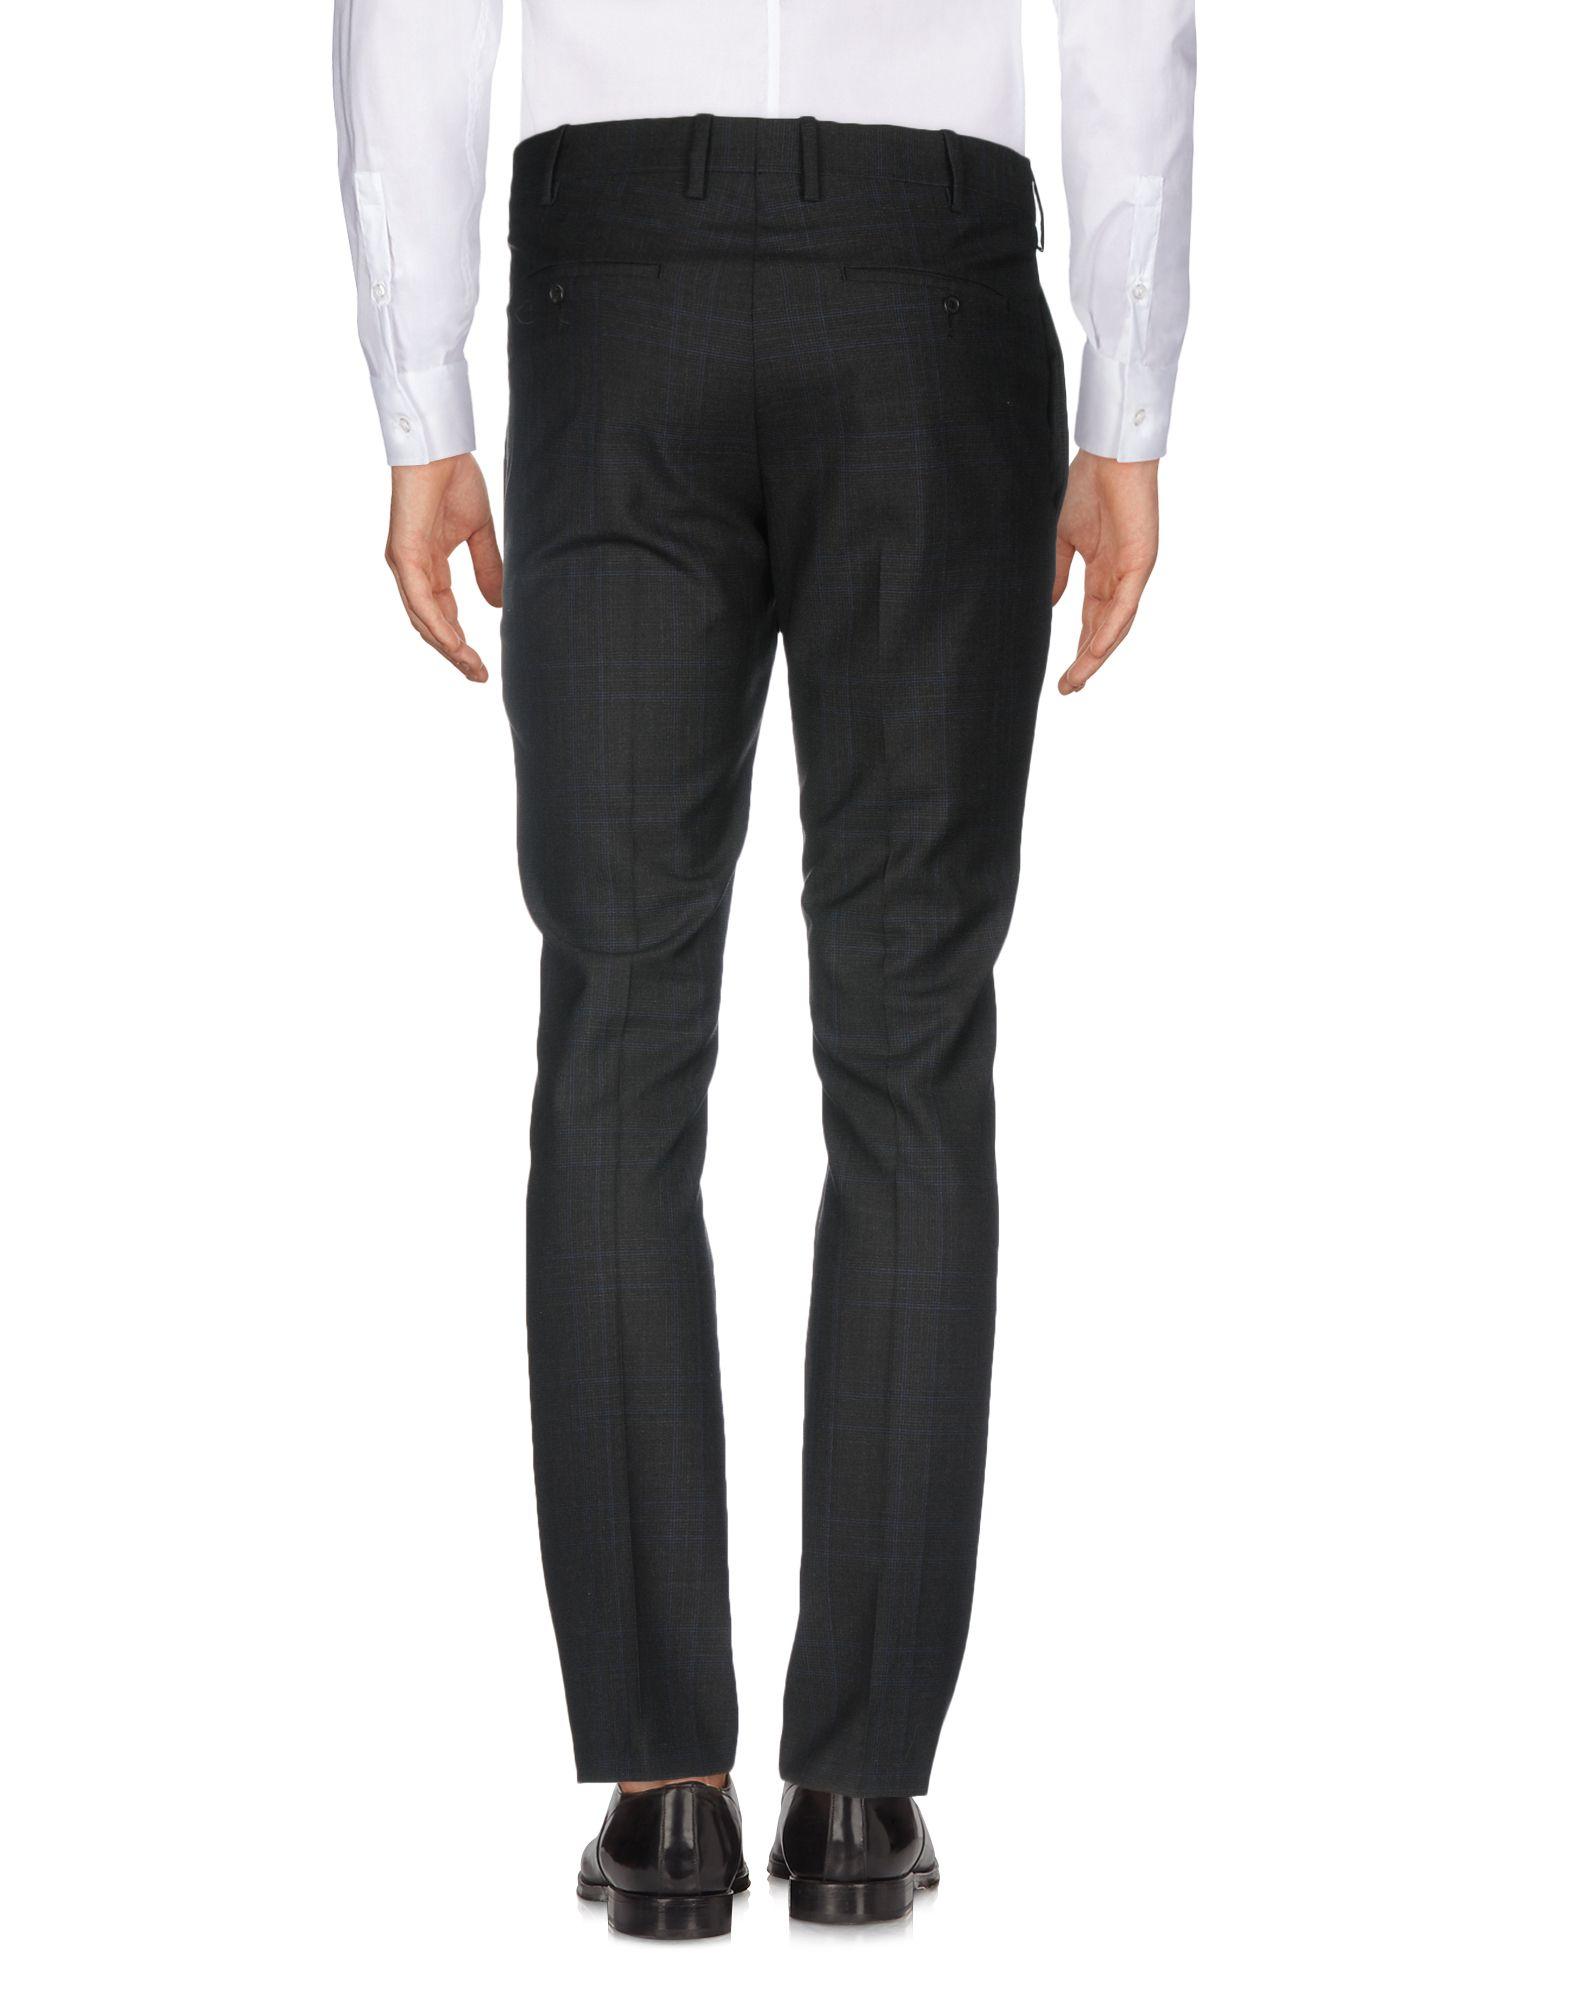 Pantalone Neil Barrett Uomo Uomo Barrett - 13162551FR b40797